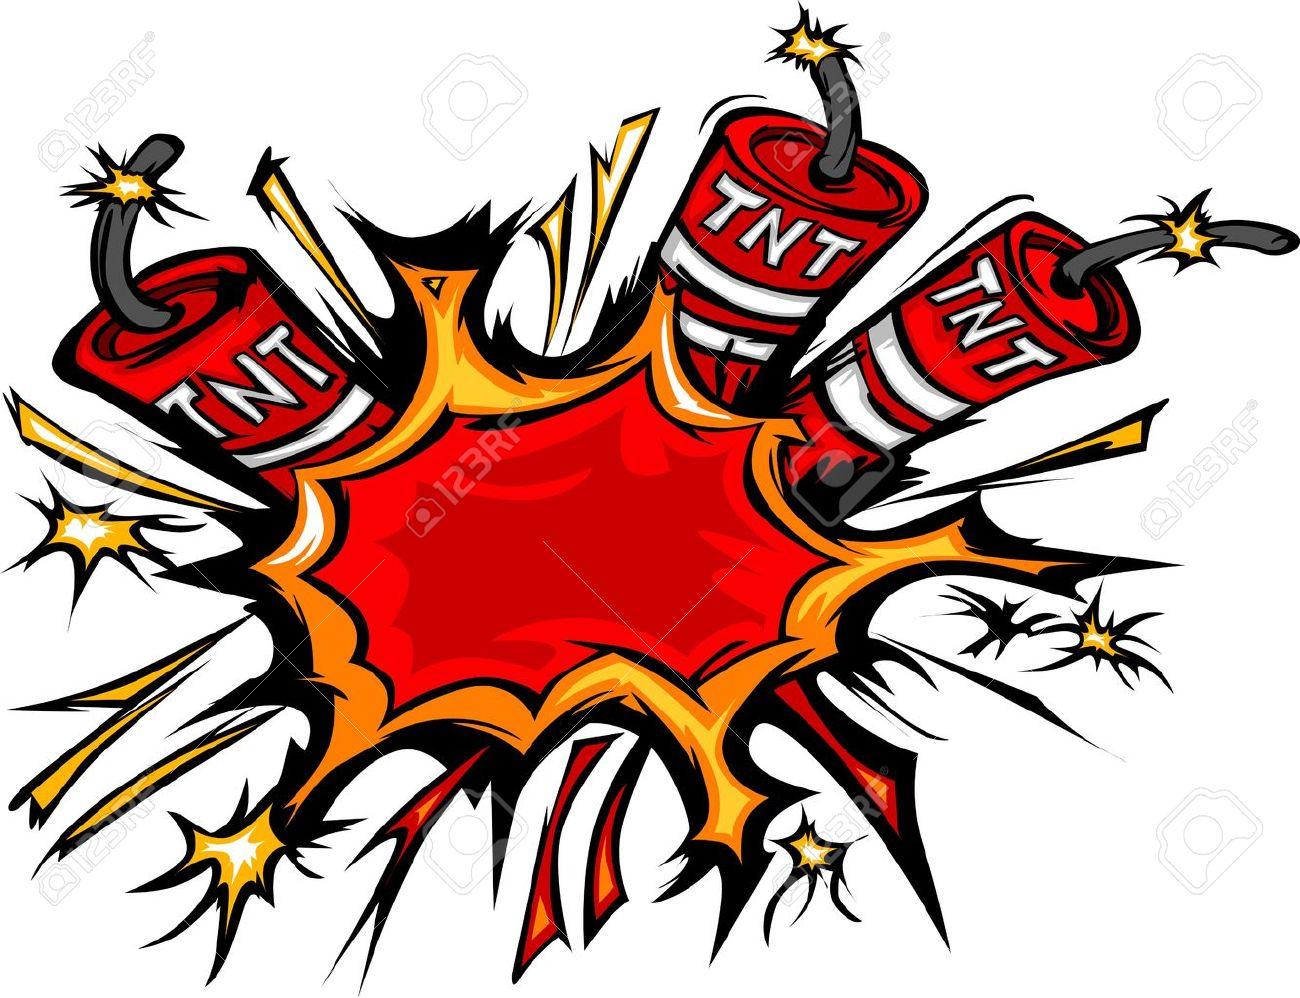 cartoon image of a exploding dynamite sticks illustration royalty rh 123rf com